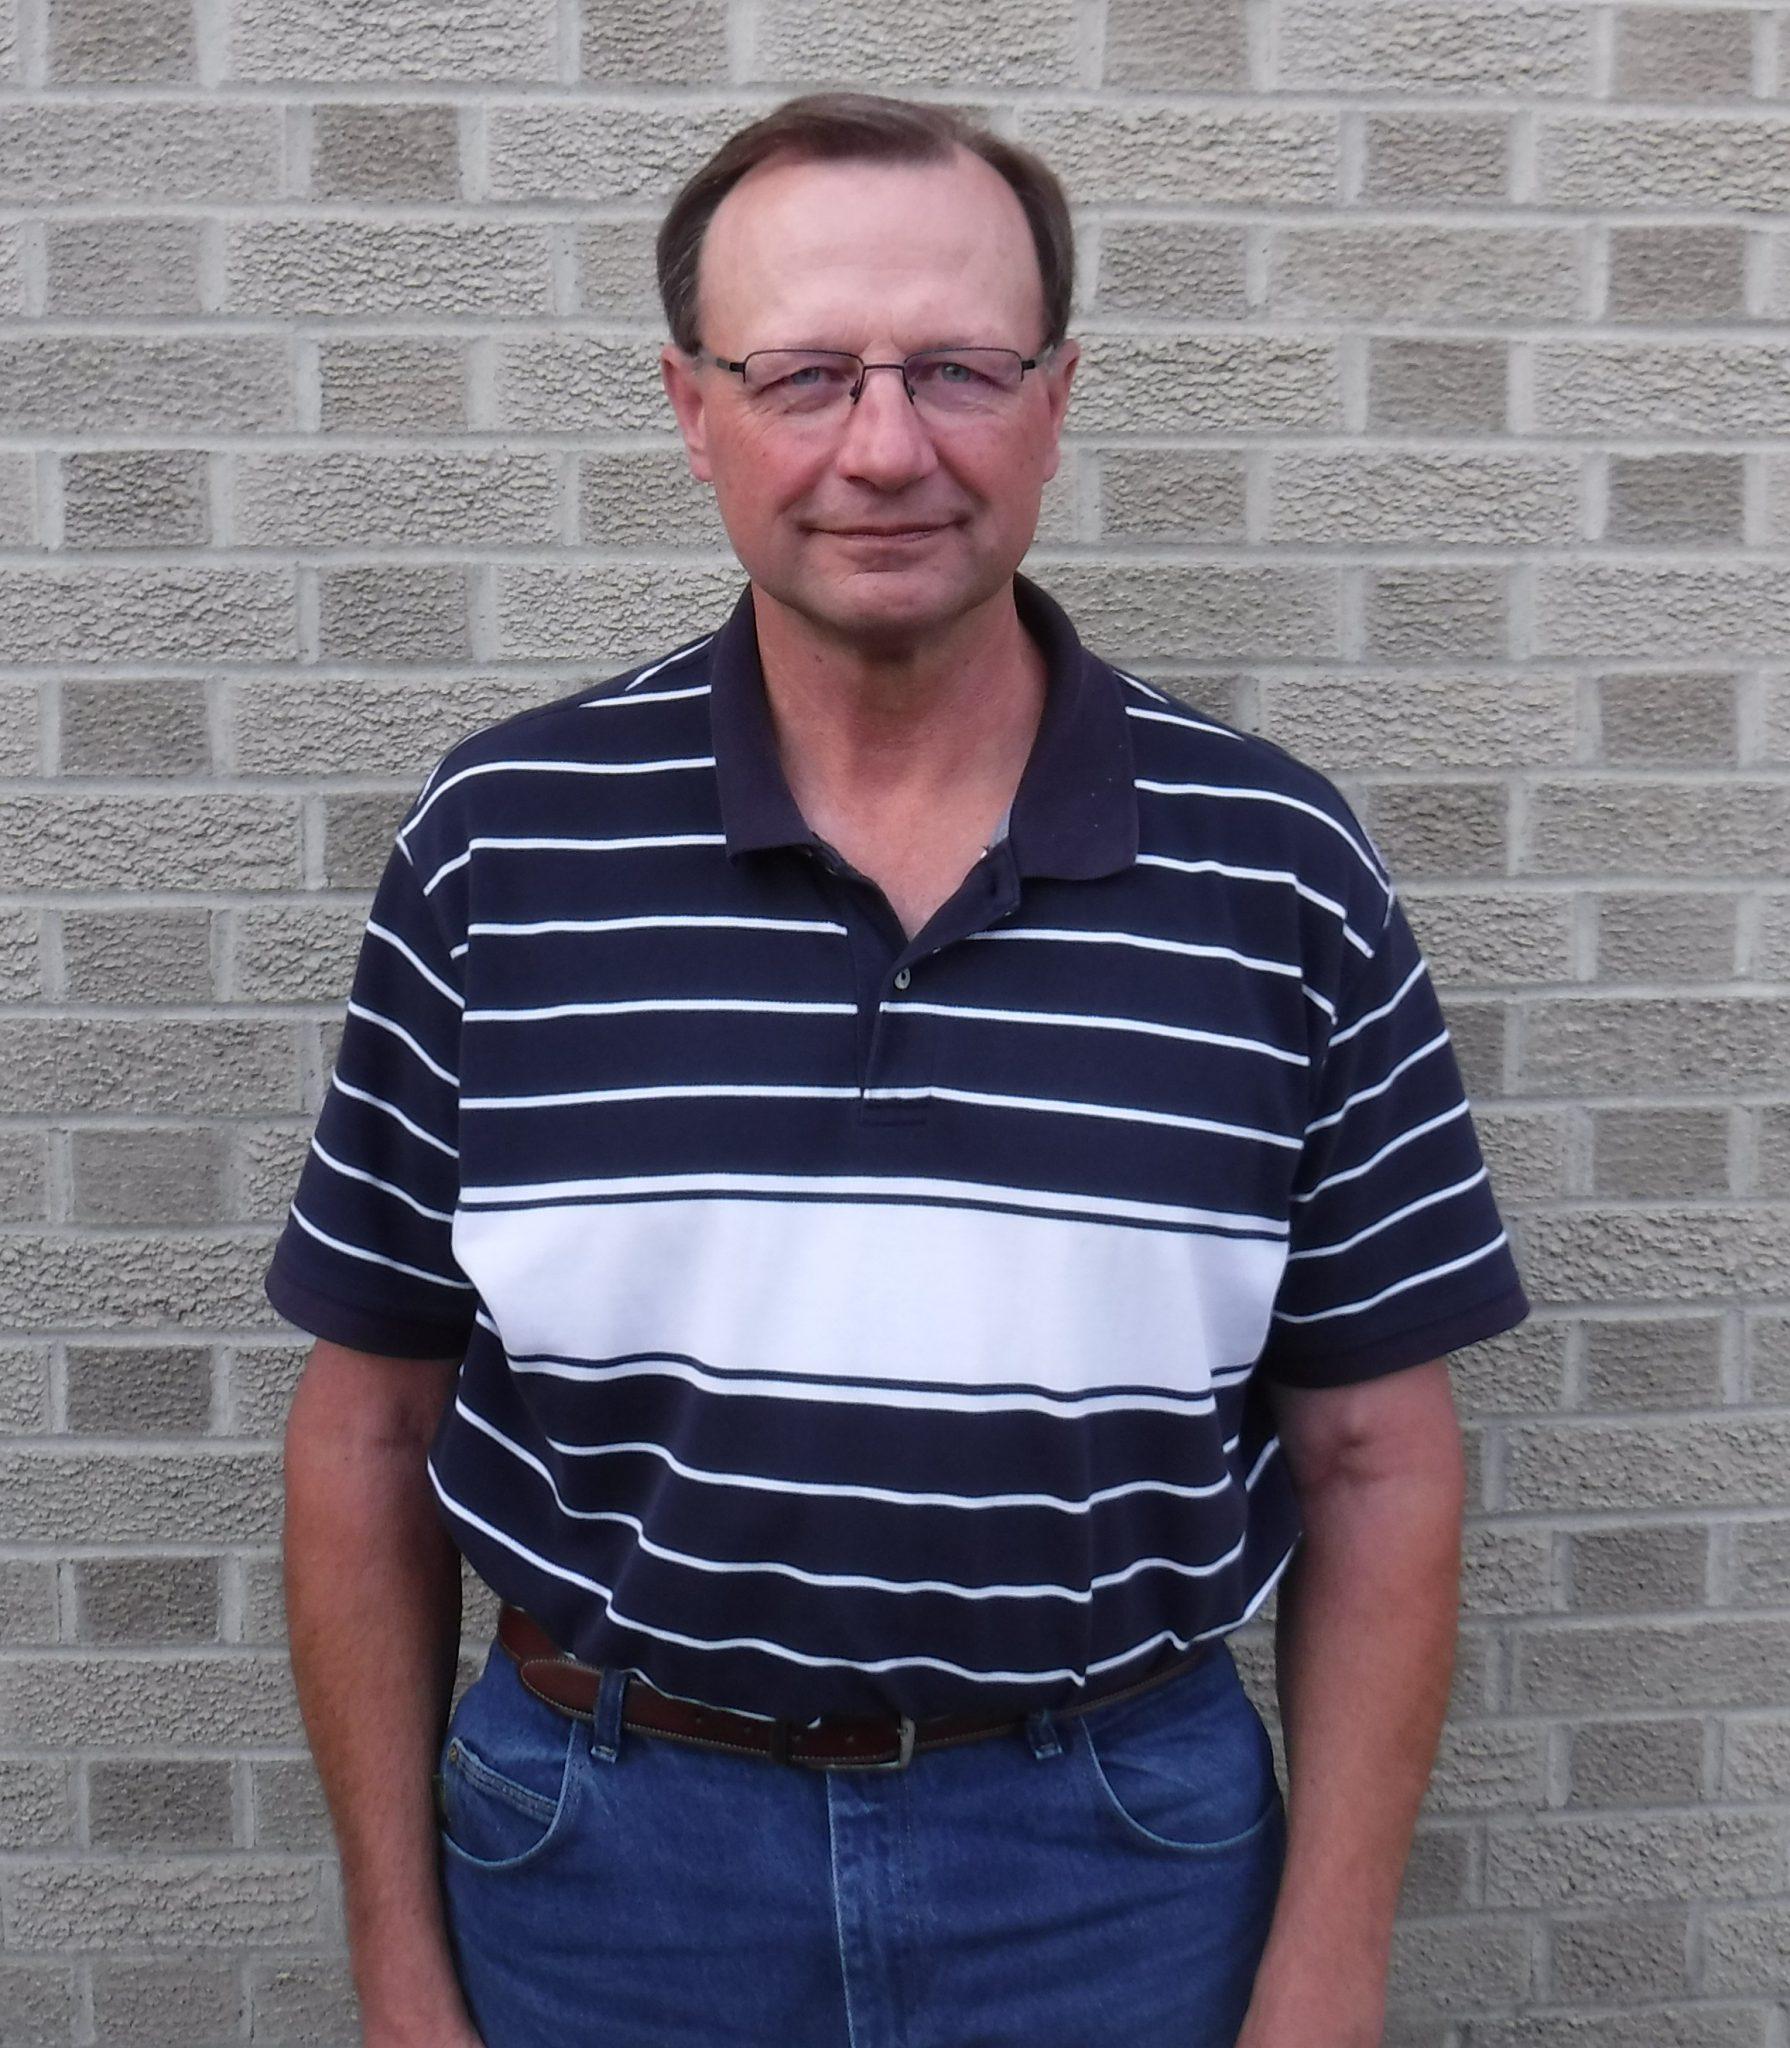 Steve Heckler